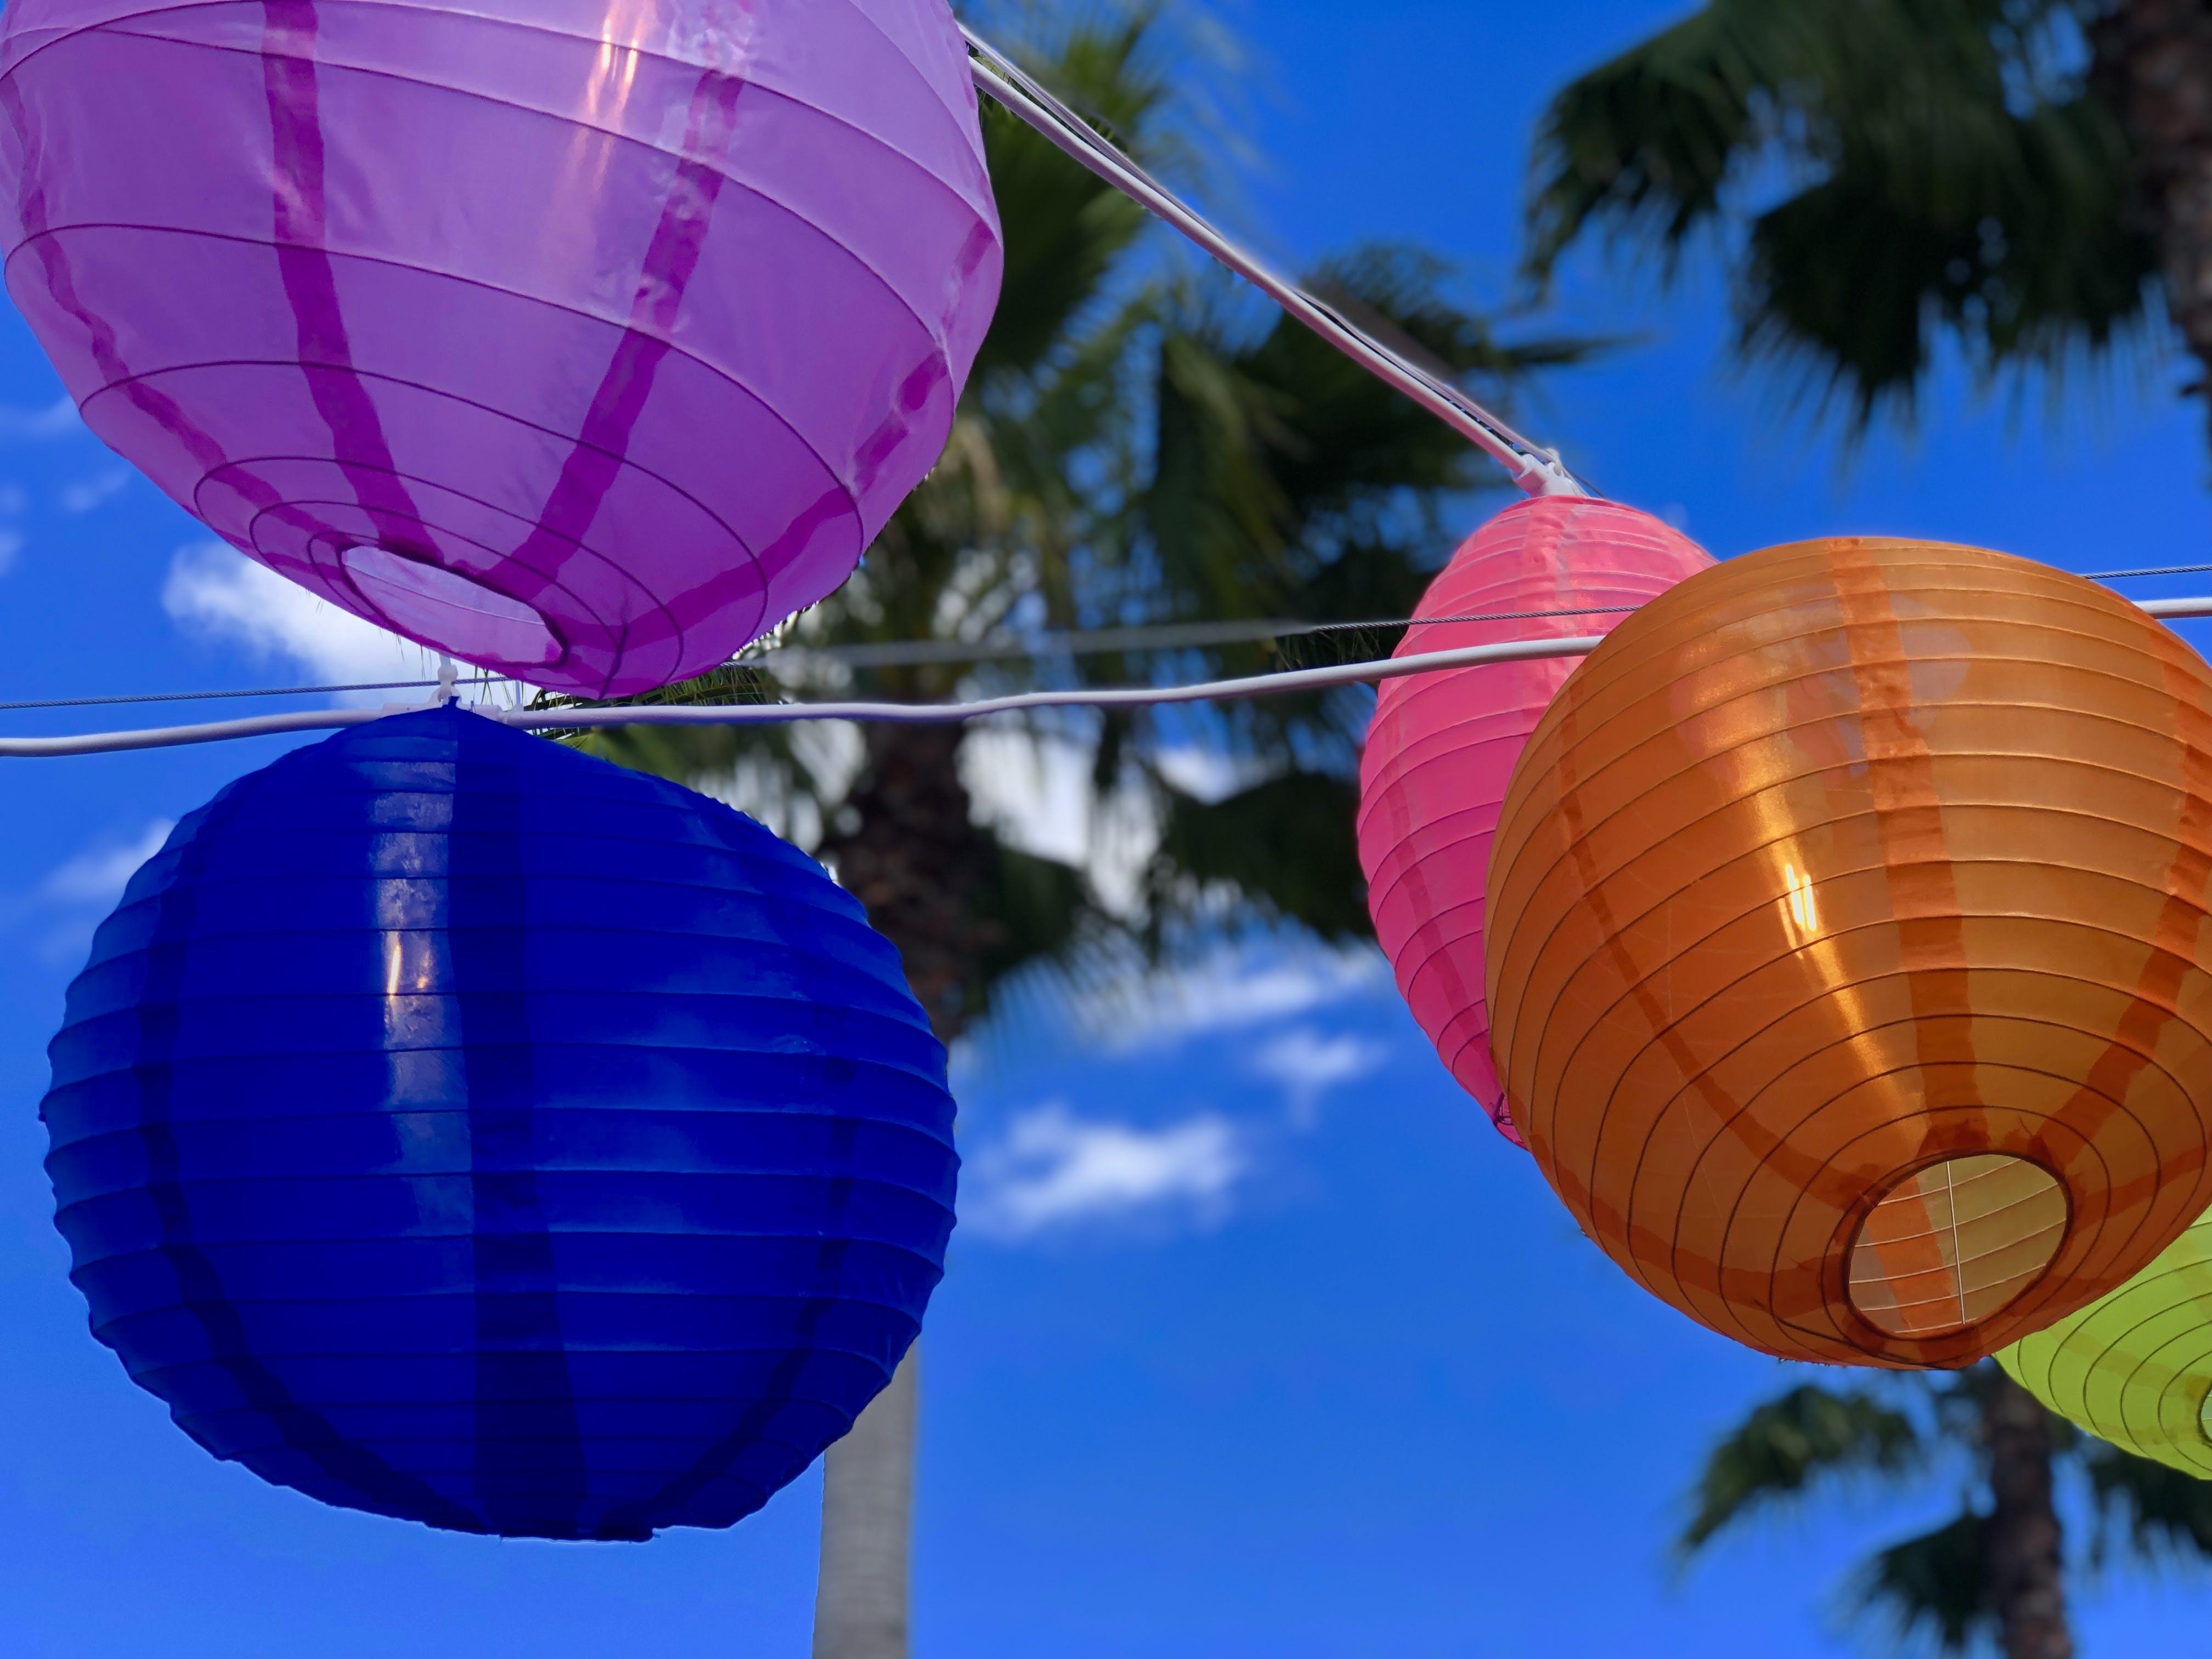 Free stock photo of chinese lanterns, colorful, palm tree, paper lanterns